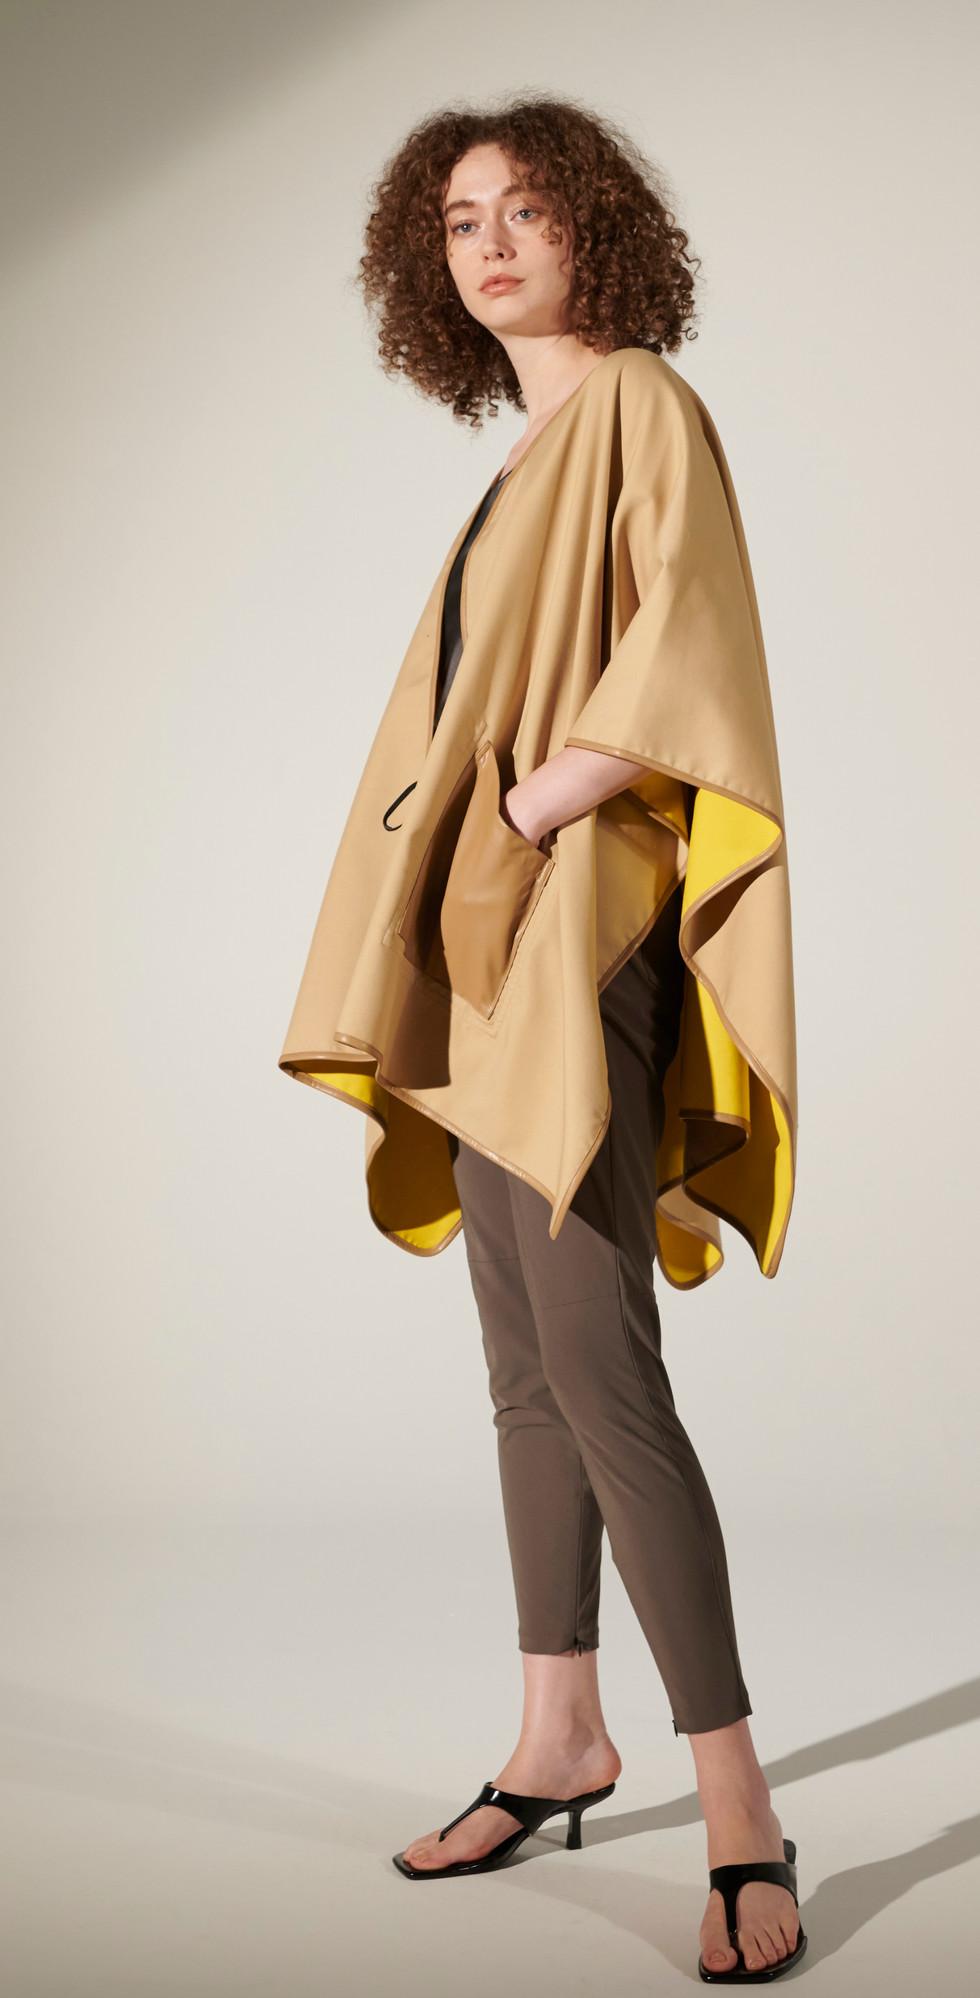 coat R8C-71-11245T pants R8P-35-6815